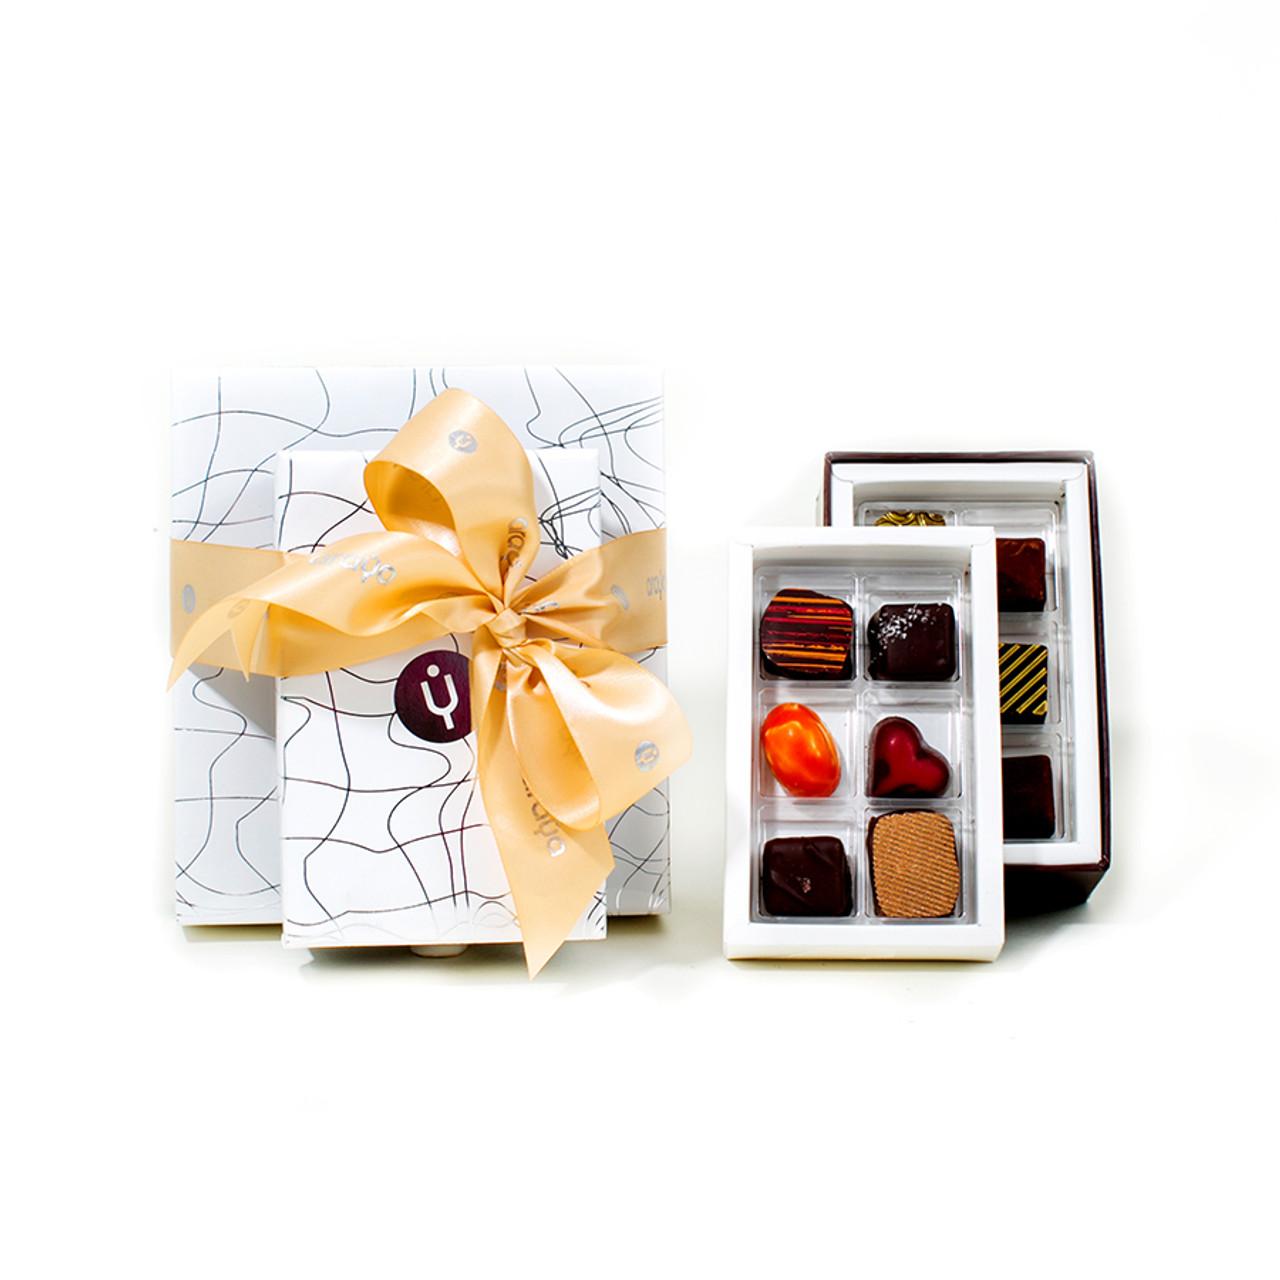 5%  -15% OFF Chocolate & Macaron Combination